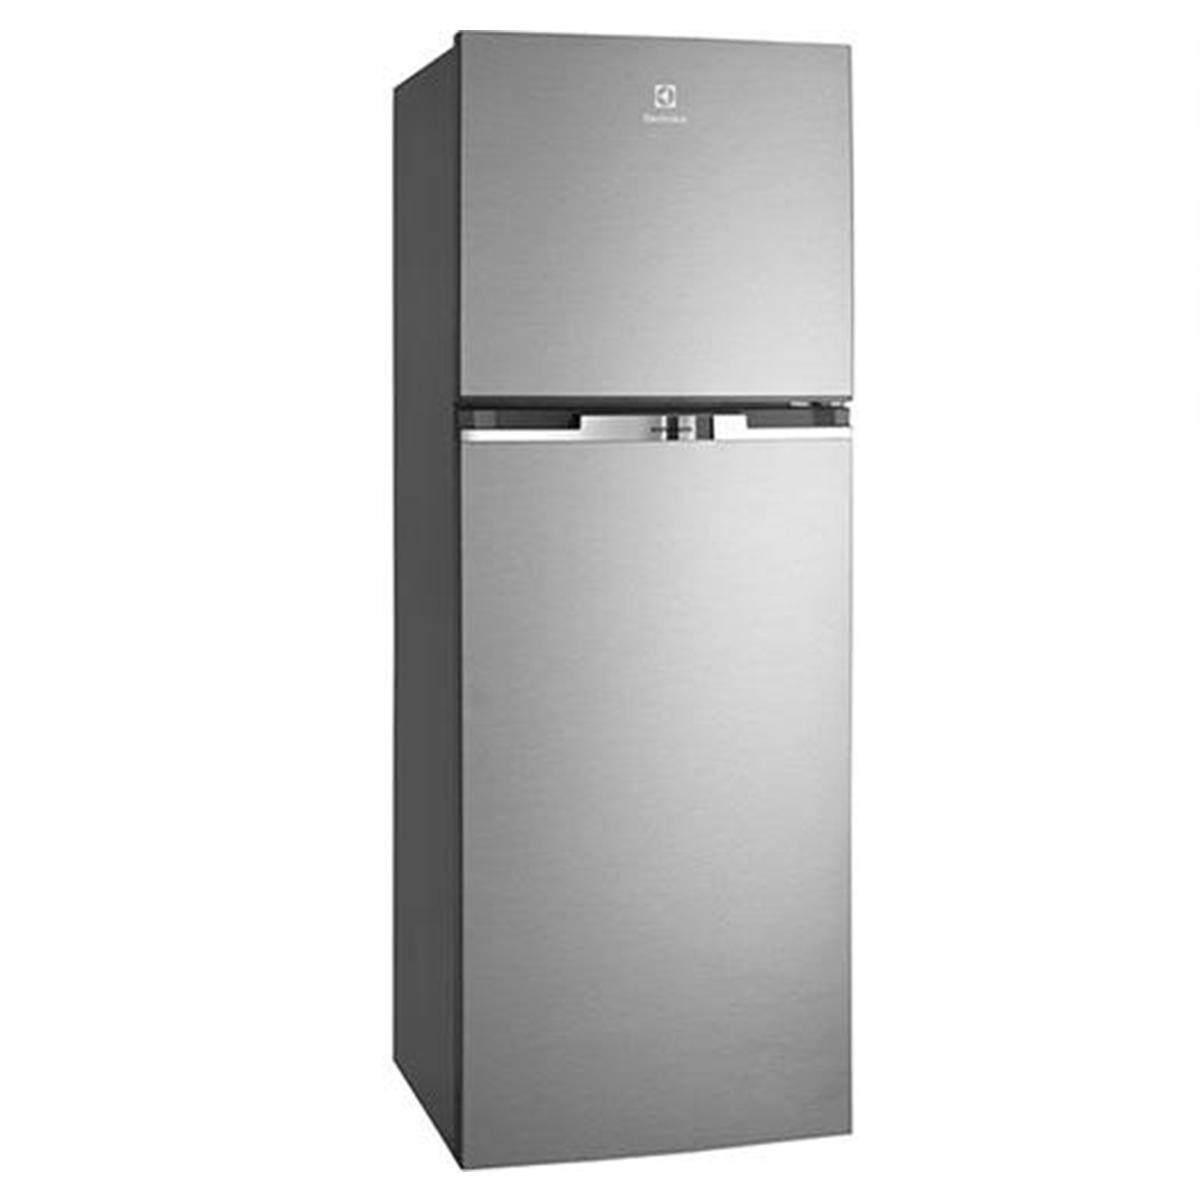 ELECTROLUX ตู้เย็น 2 ประตู 8 คิว รุ่น ETB 2300 MG